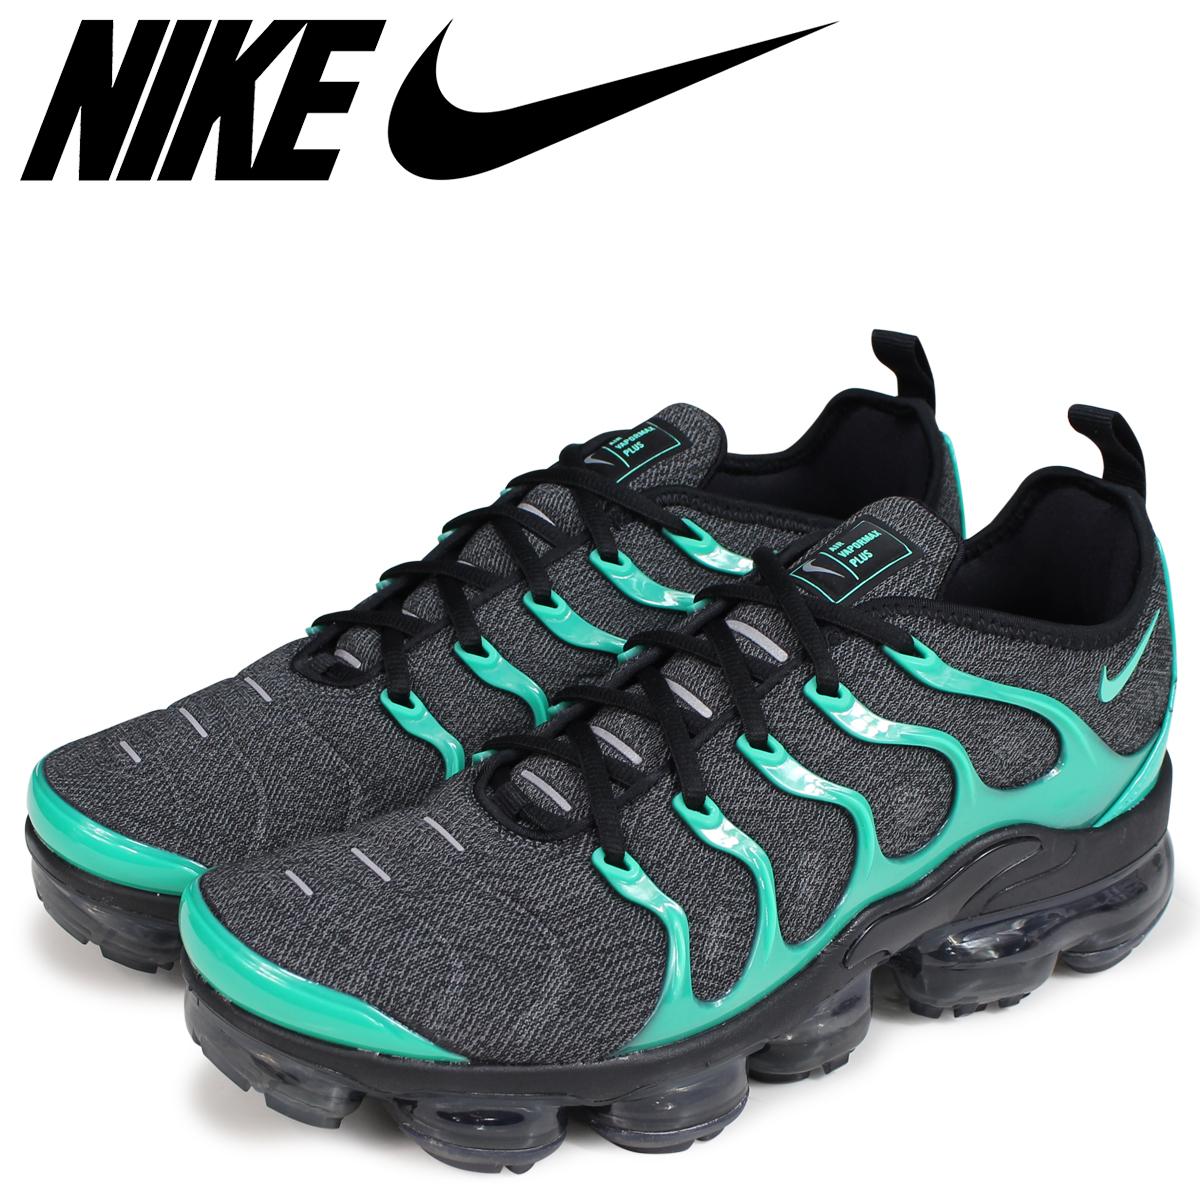 eb6adf11e2a74 NIKE Nike air vapor max plus sneakers men AIR VAPORMAX PLUS 924,453-013  black ...